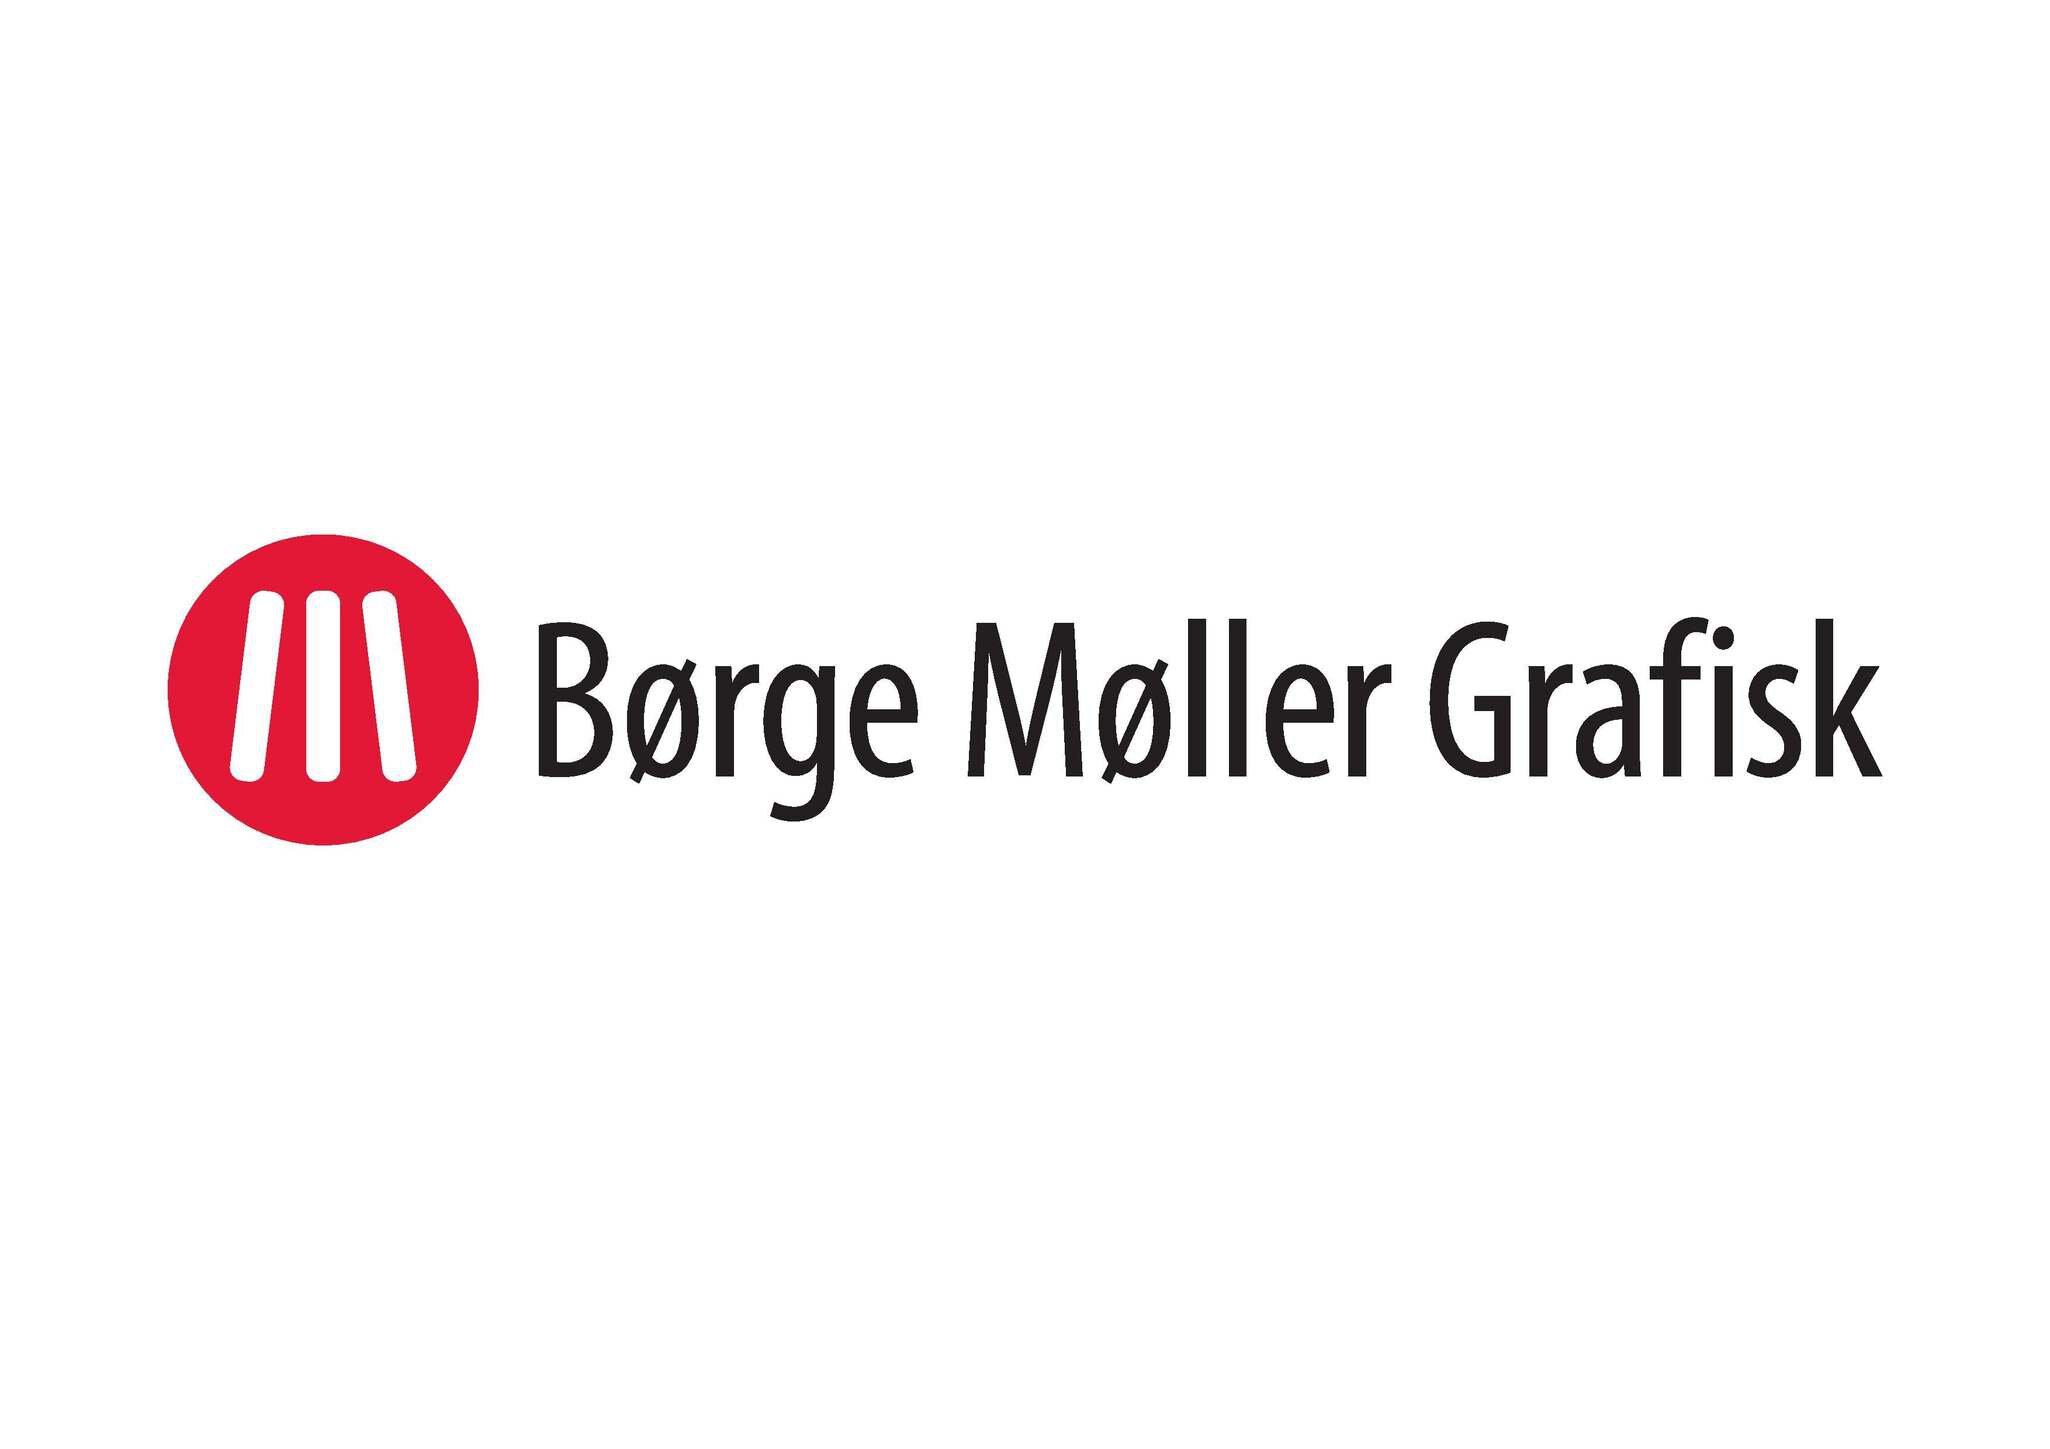 Børge Møller Grafisk logo